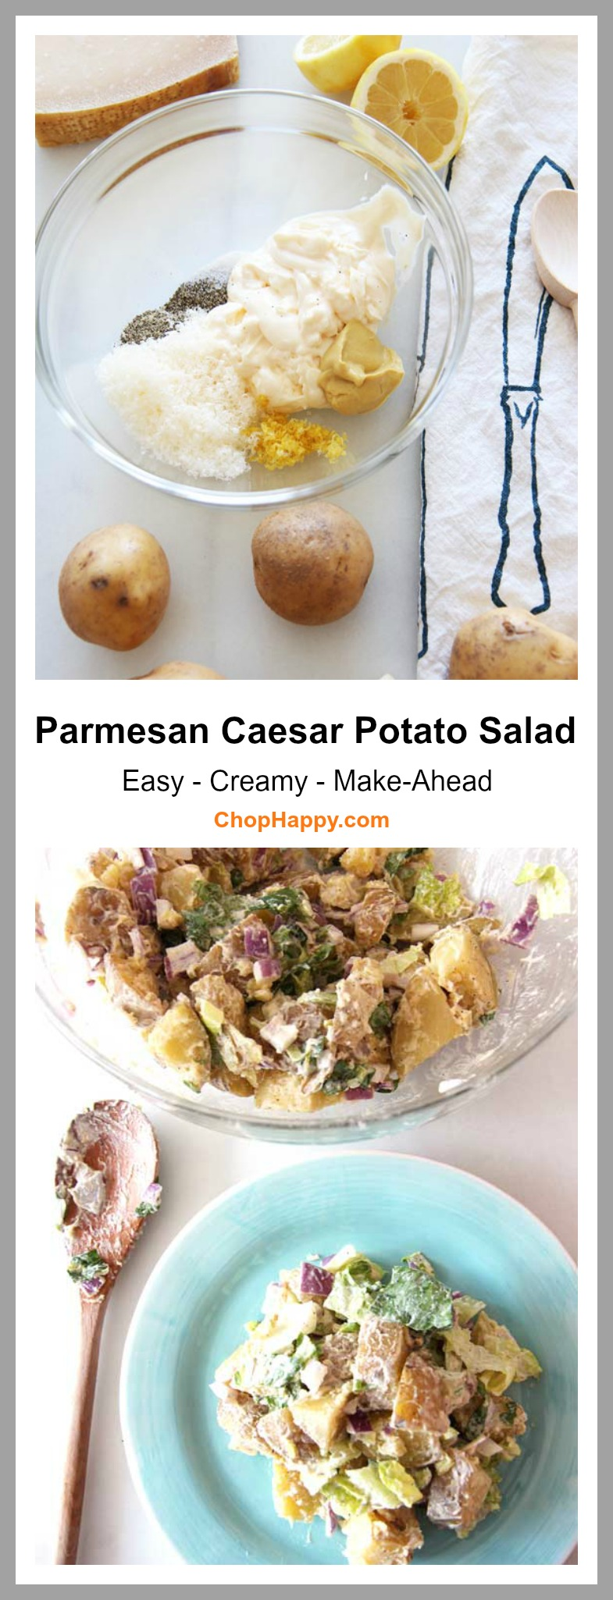 Parmesan Caesar Potato Salad Recipe. An easy creamy recipe that is great for make-ahead ideas. ChopHappy.com